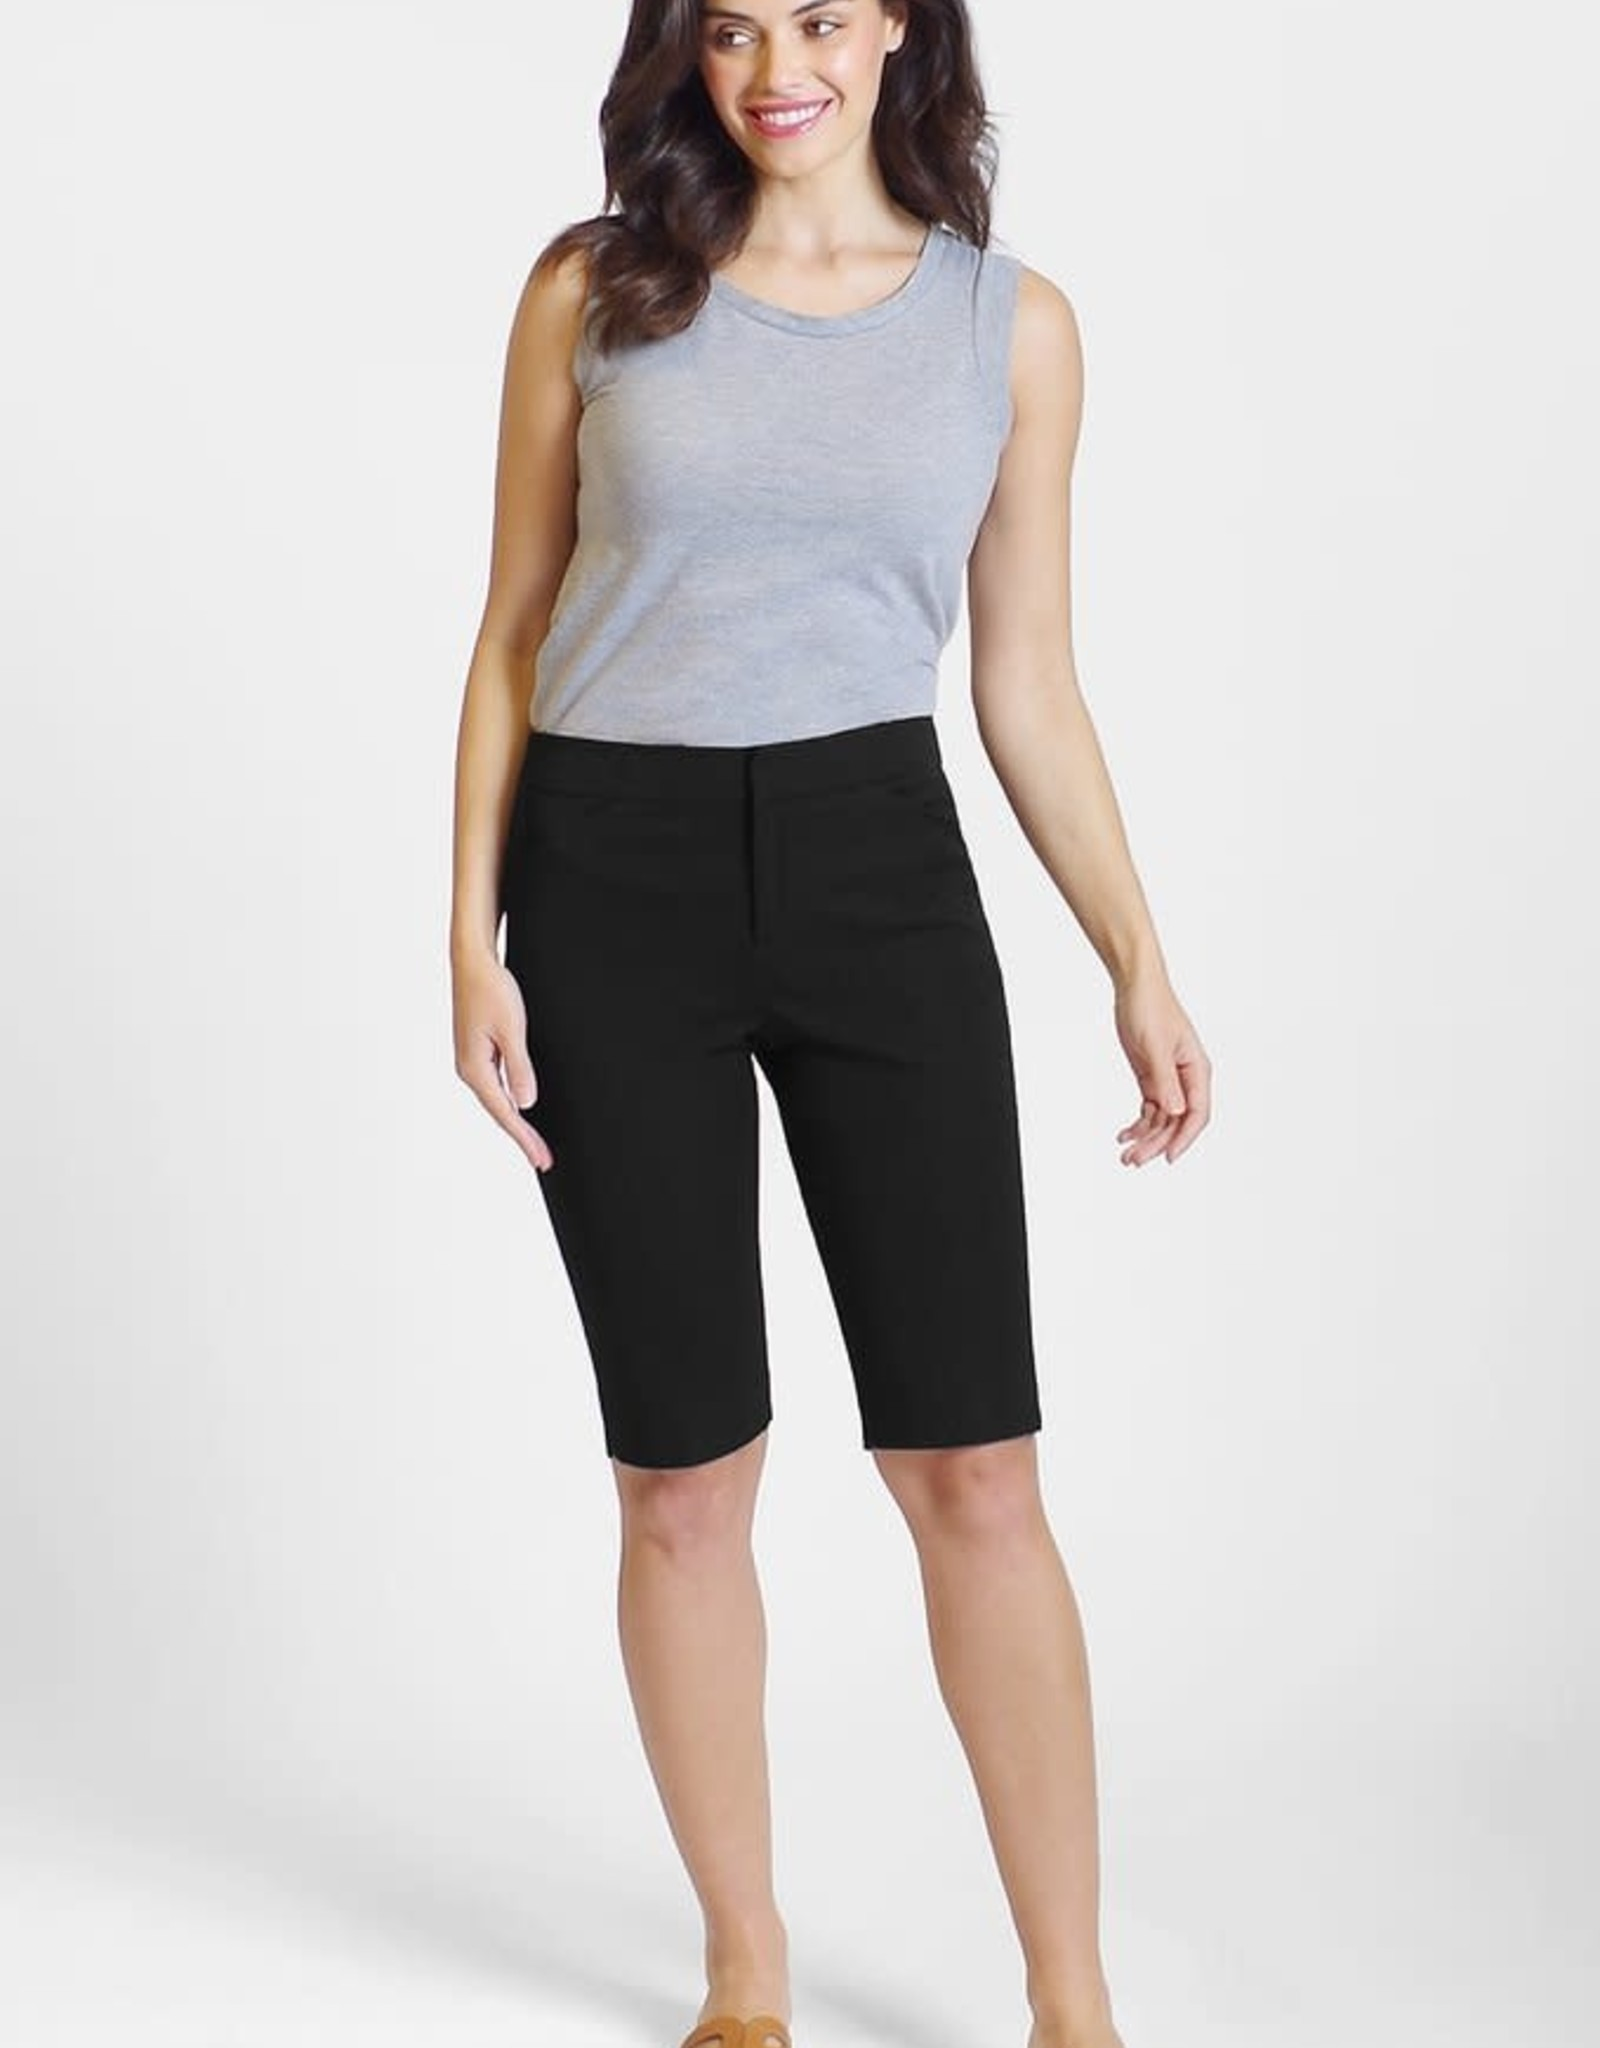 PEACE OF CLOTH - Heather Short